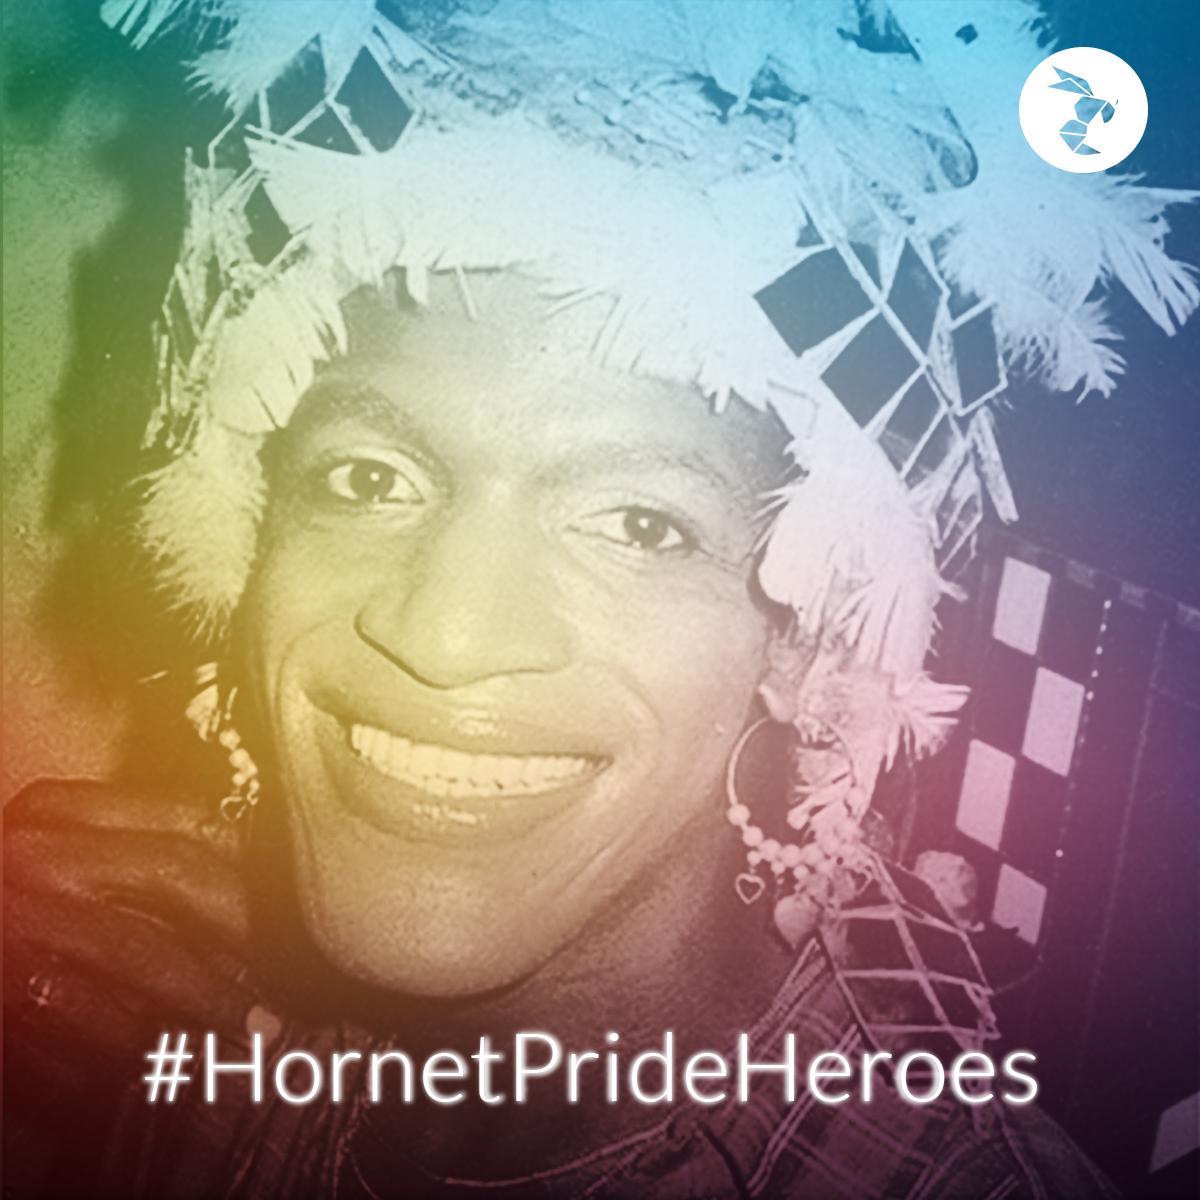 Hornet Pride Heroes marsha p johnson